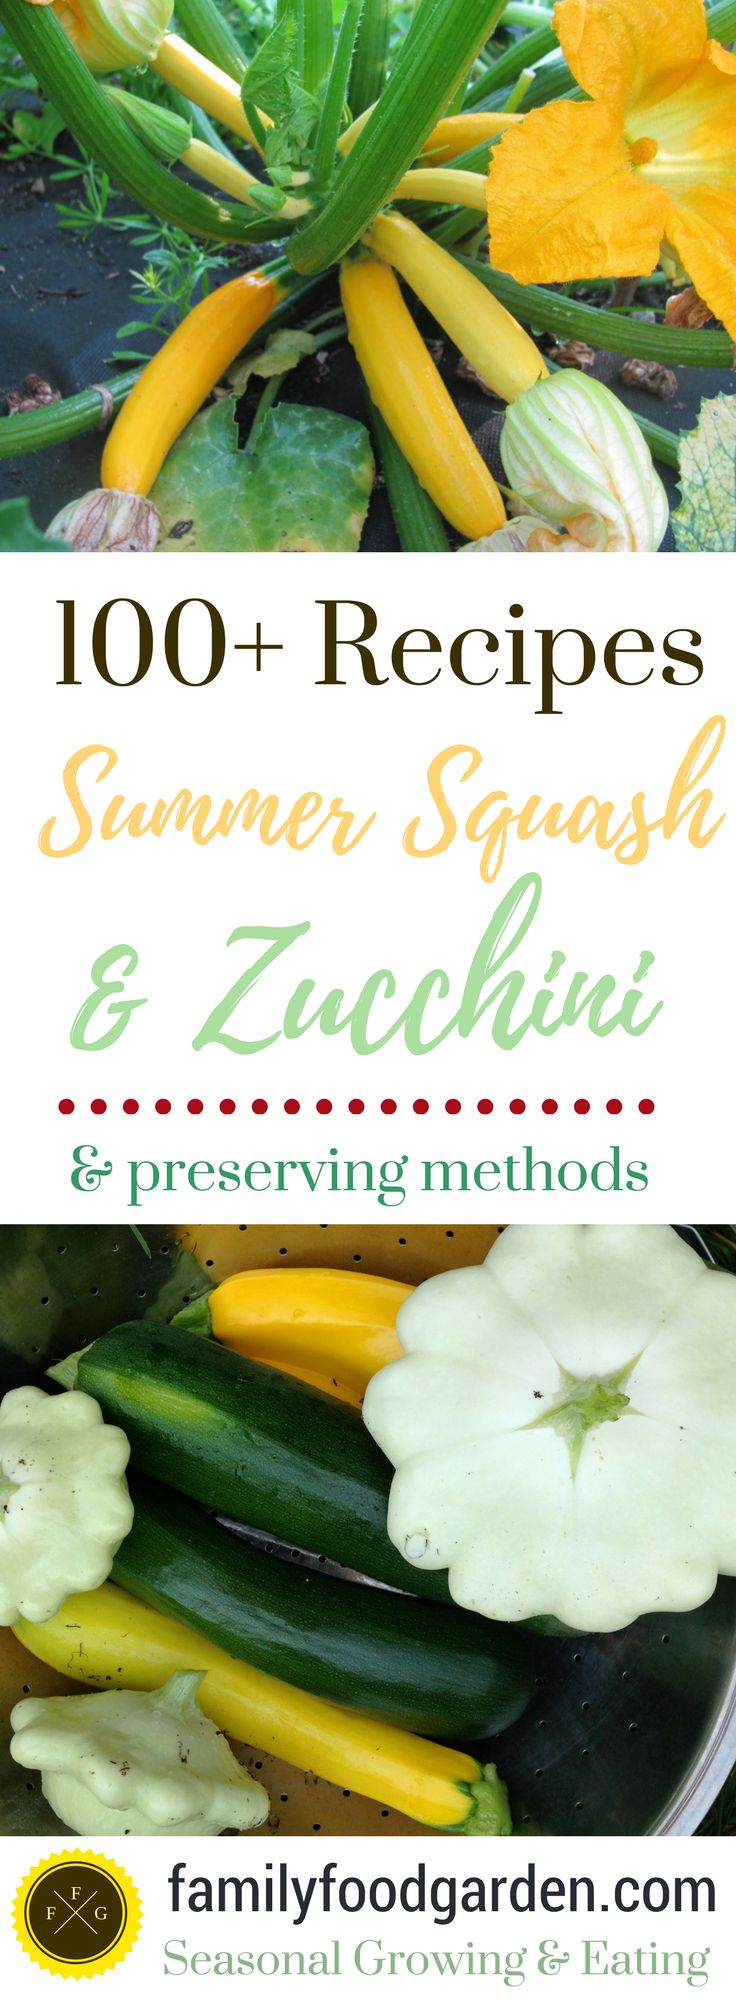 100+ Savory & Sweet Zucchini and Summer Squash Recipes